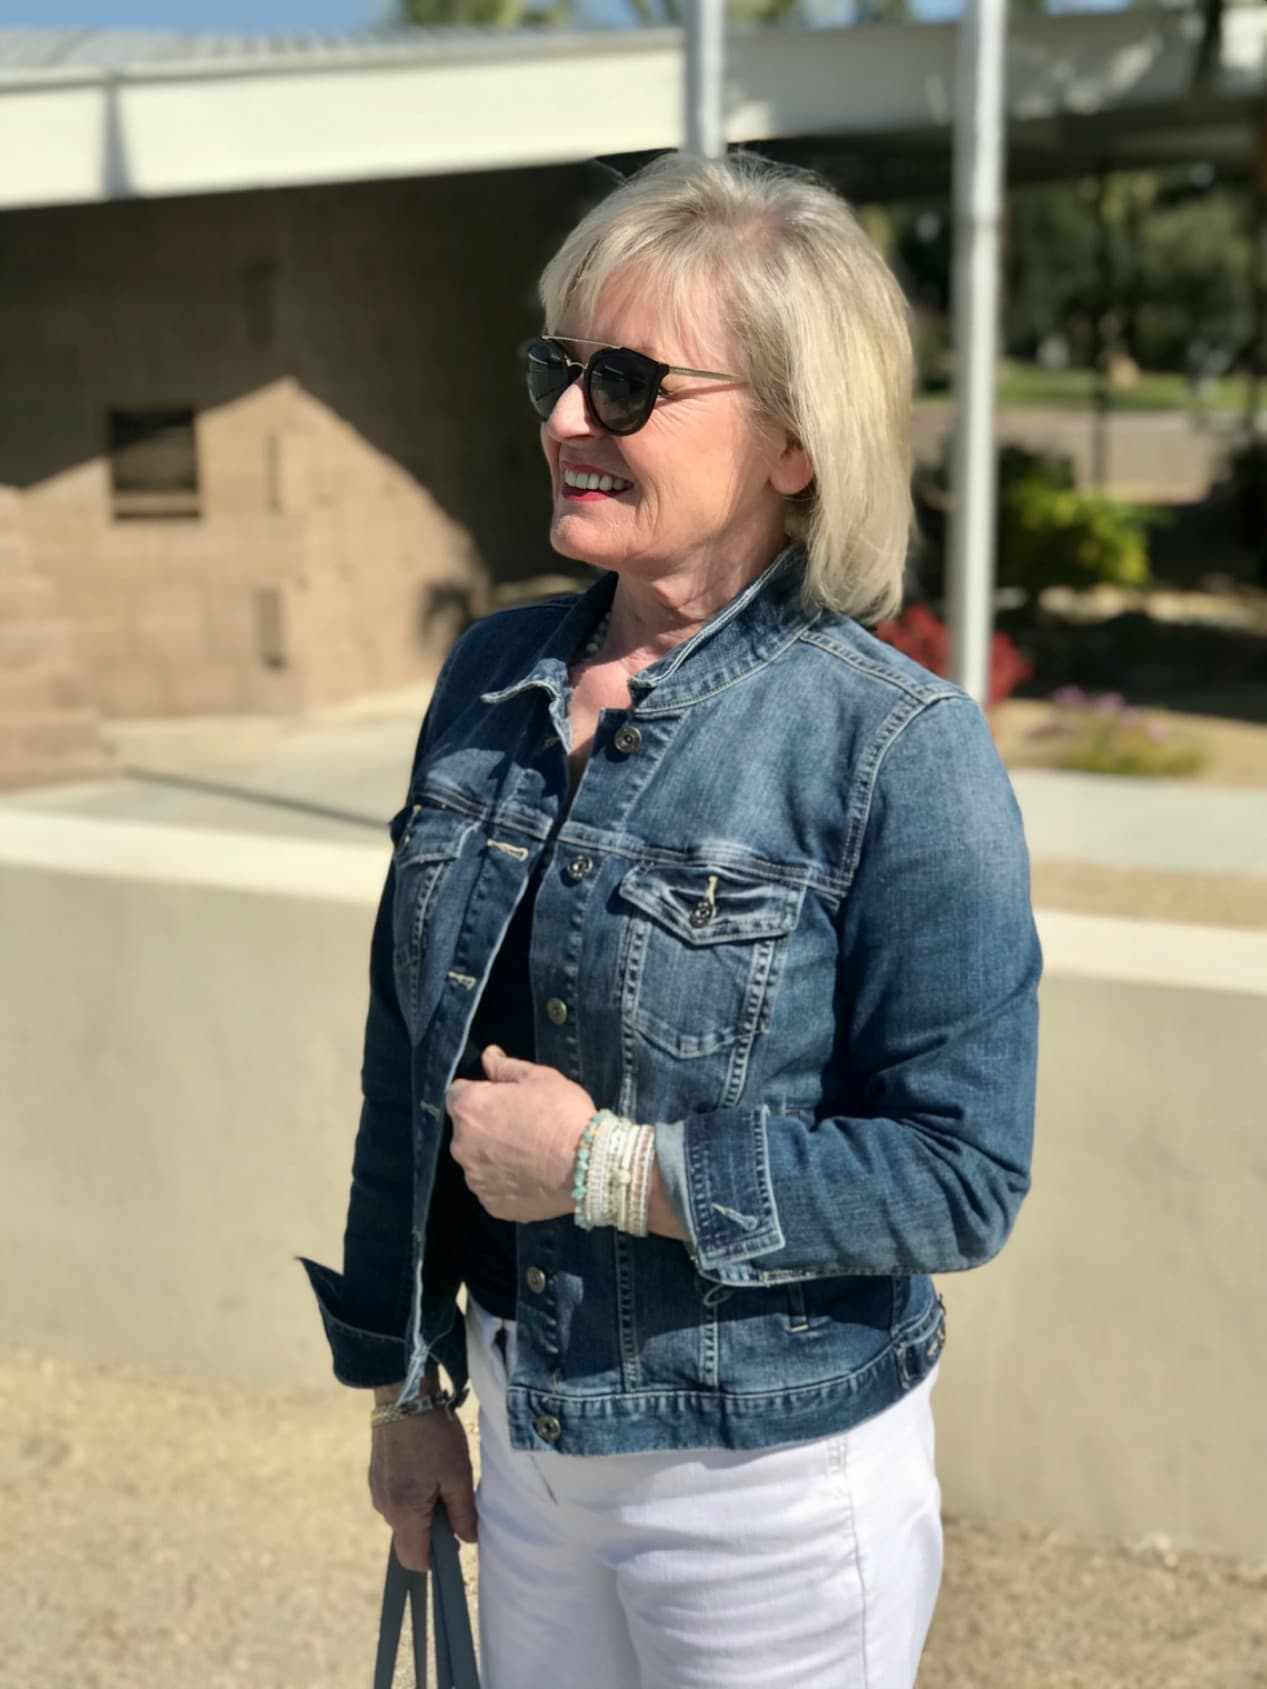 denim jacket and victoria emerson boho cuff on over 50 blogger Jennifer Connolly